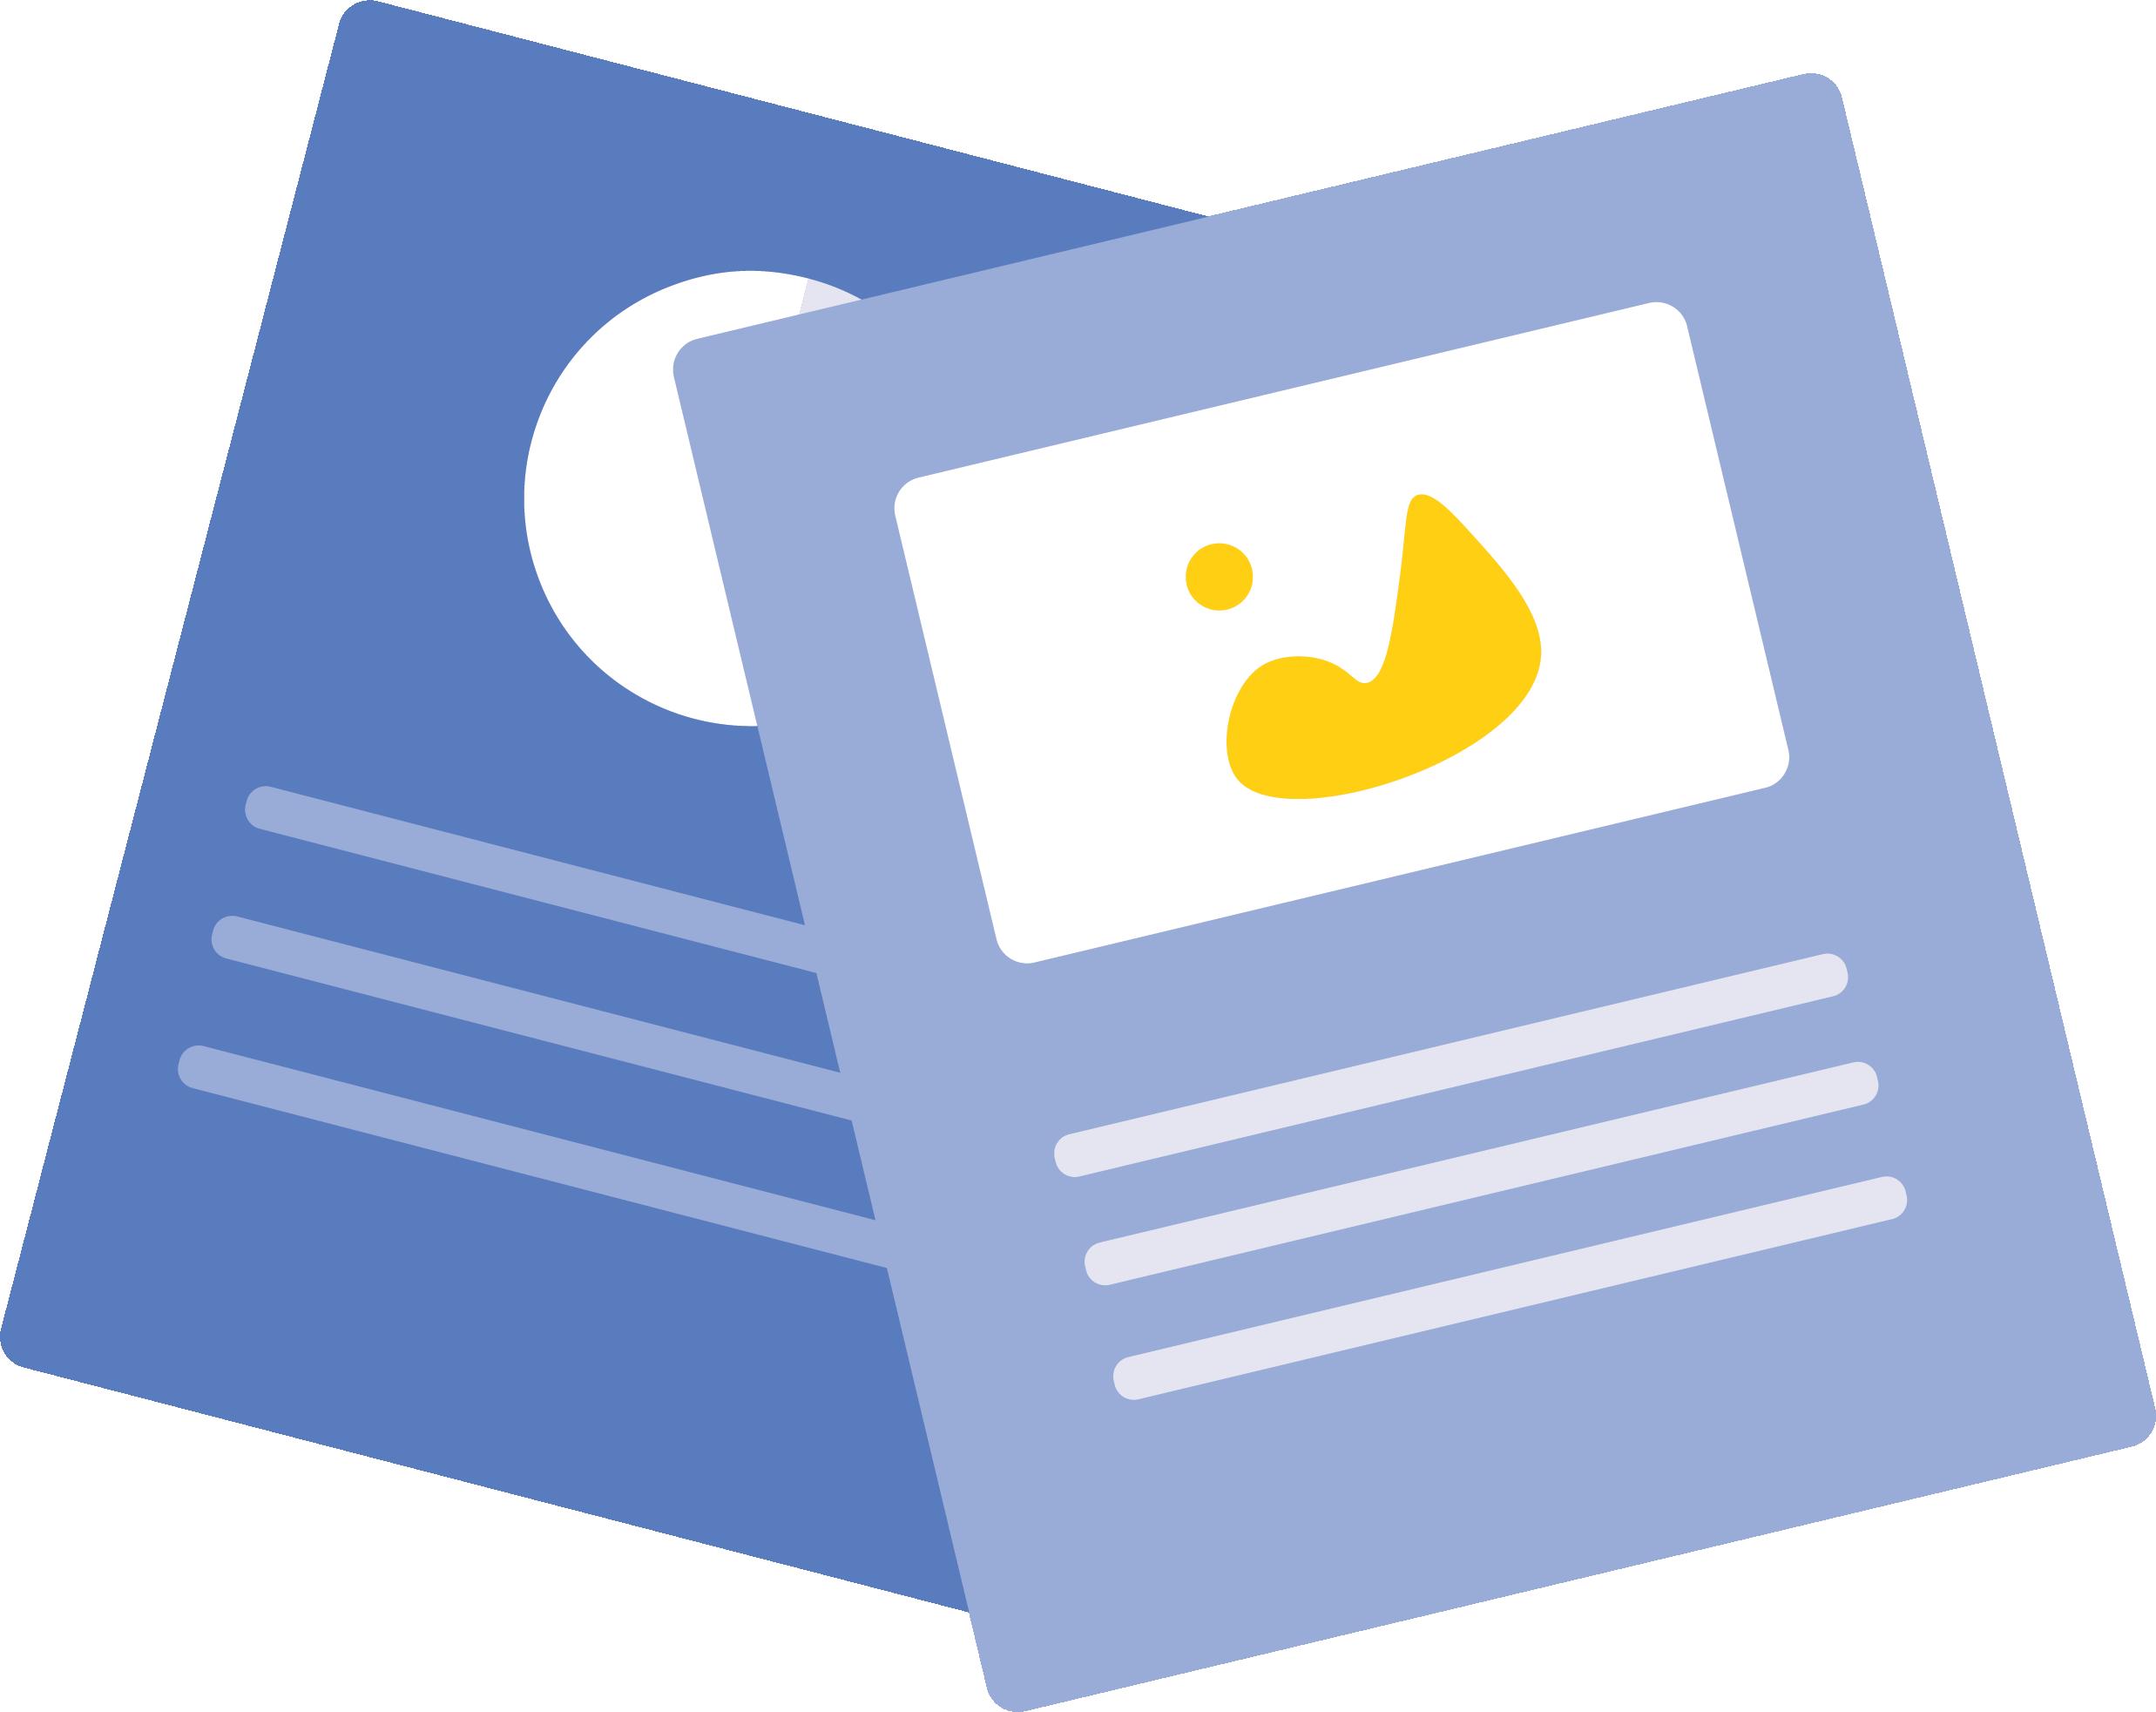 Two PDF icons